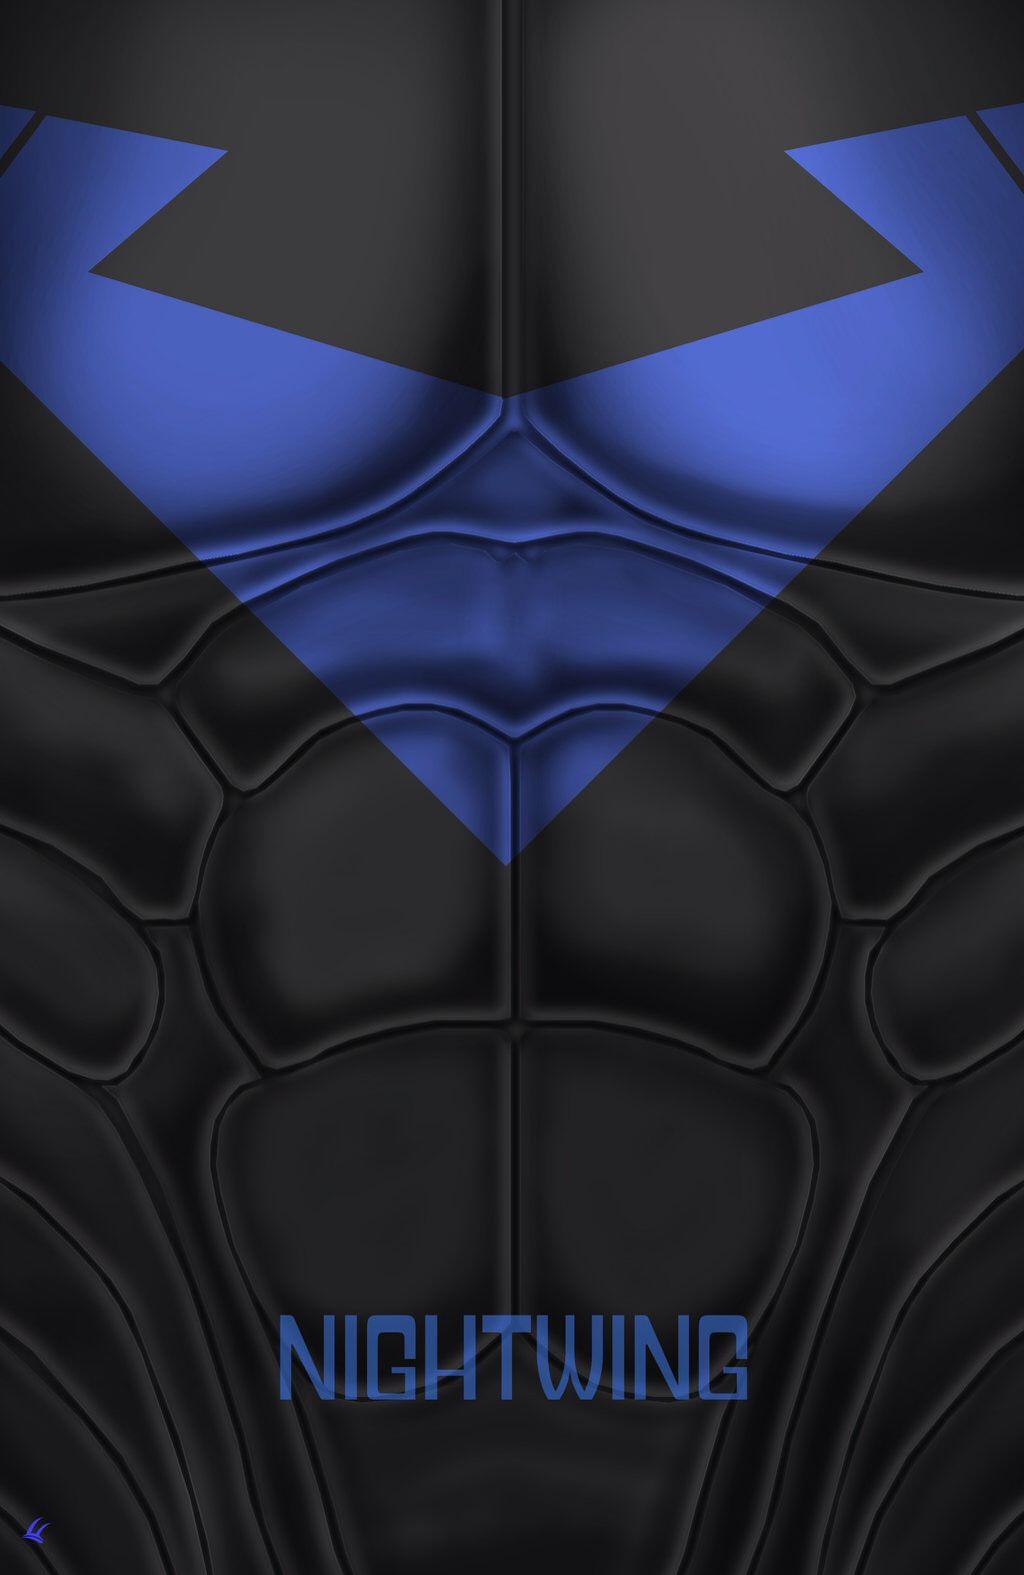 Nightwing Wallpaper Nightwing Wallpaper Nightwing Superhero